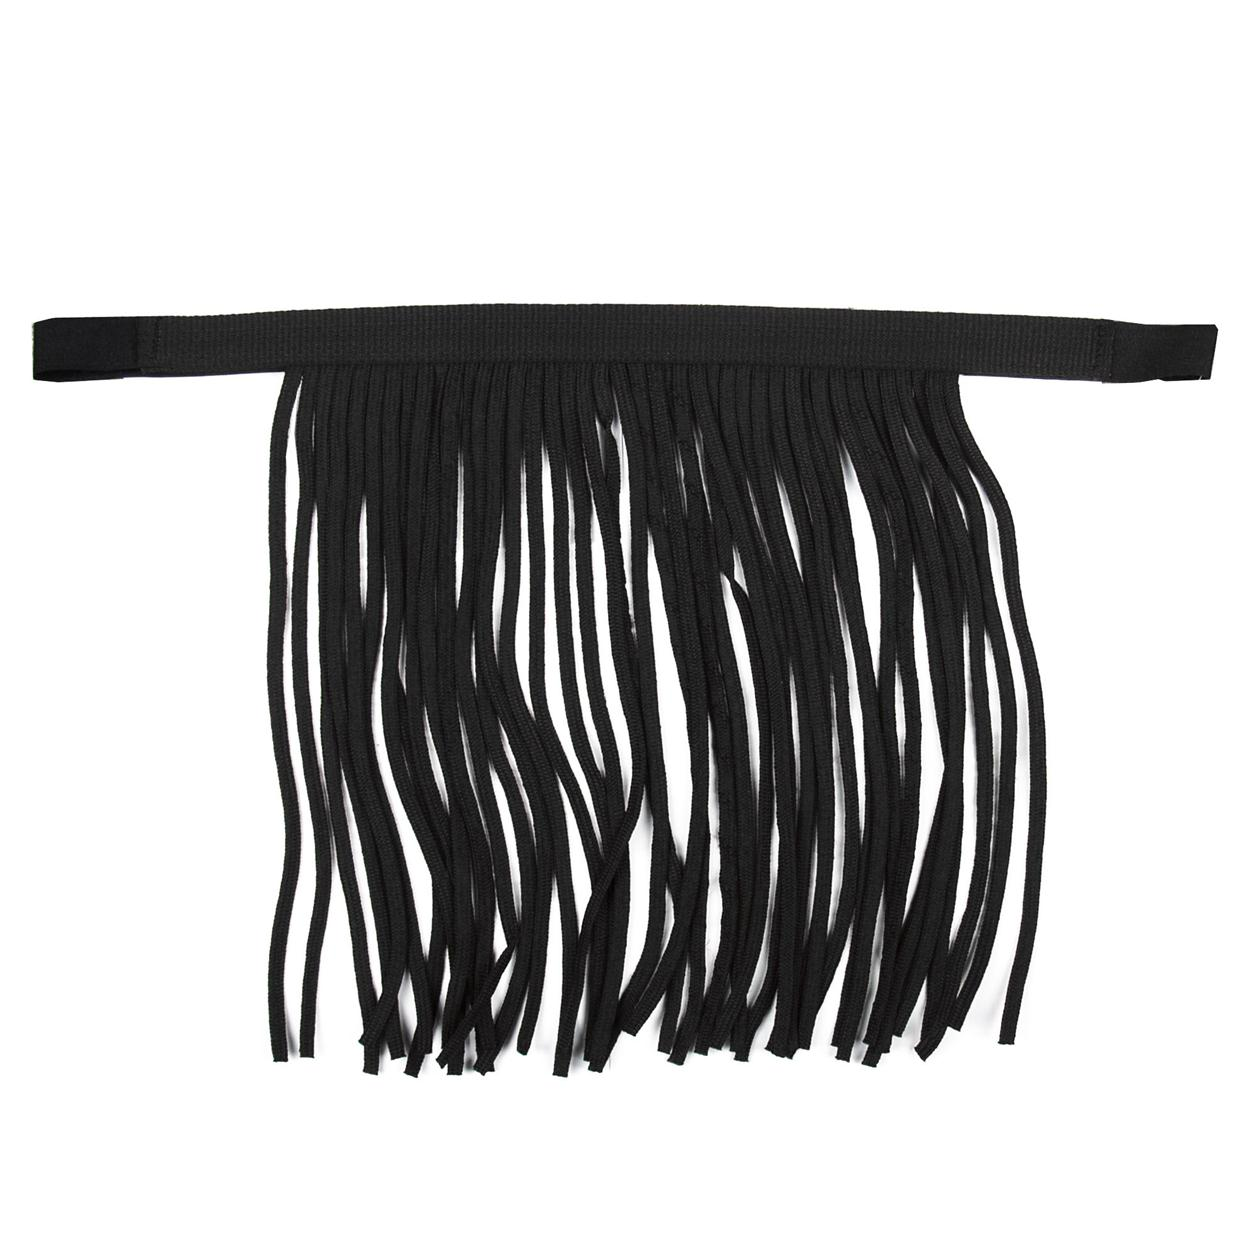 Pagony vliegenfrontriem nylon zwart maat:full